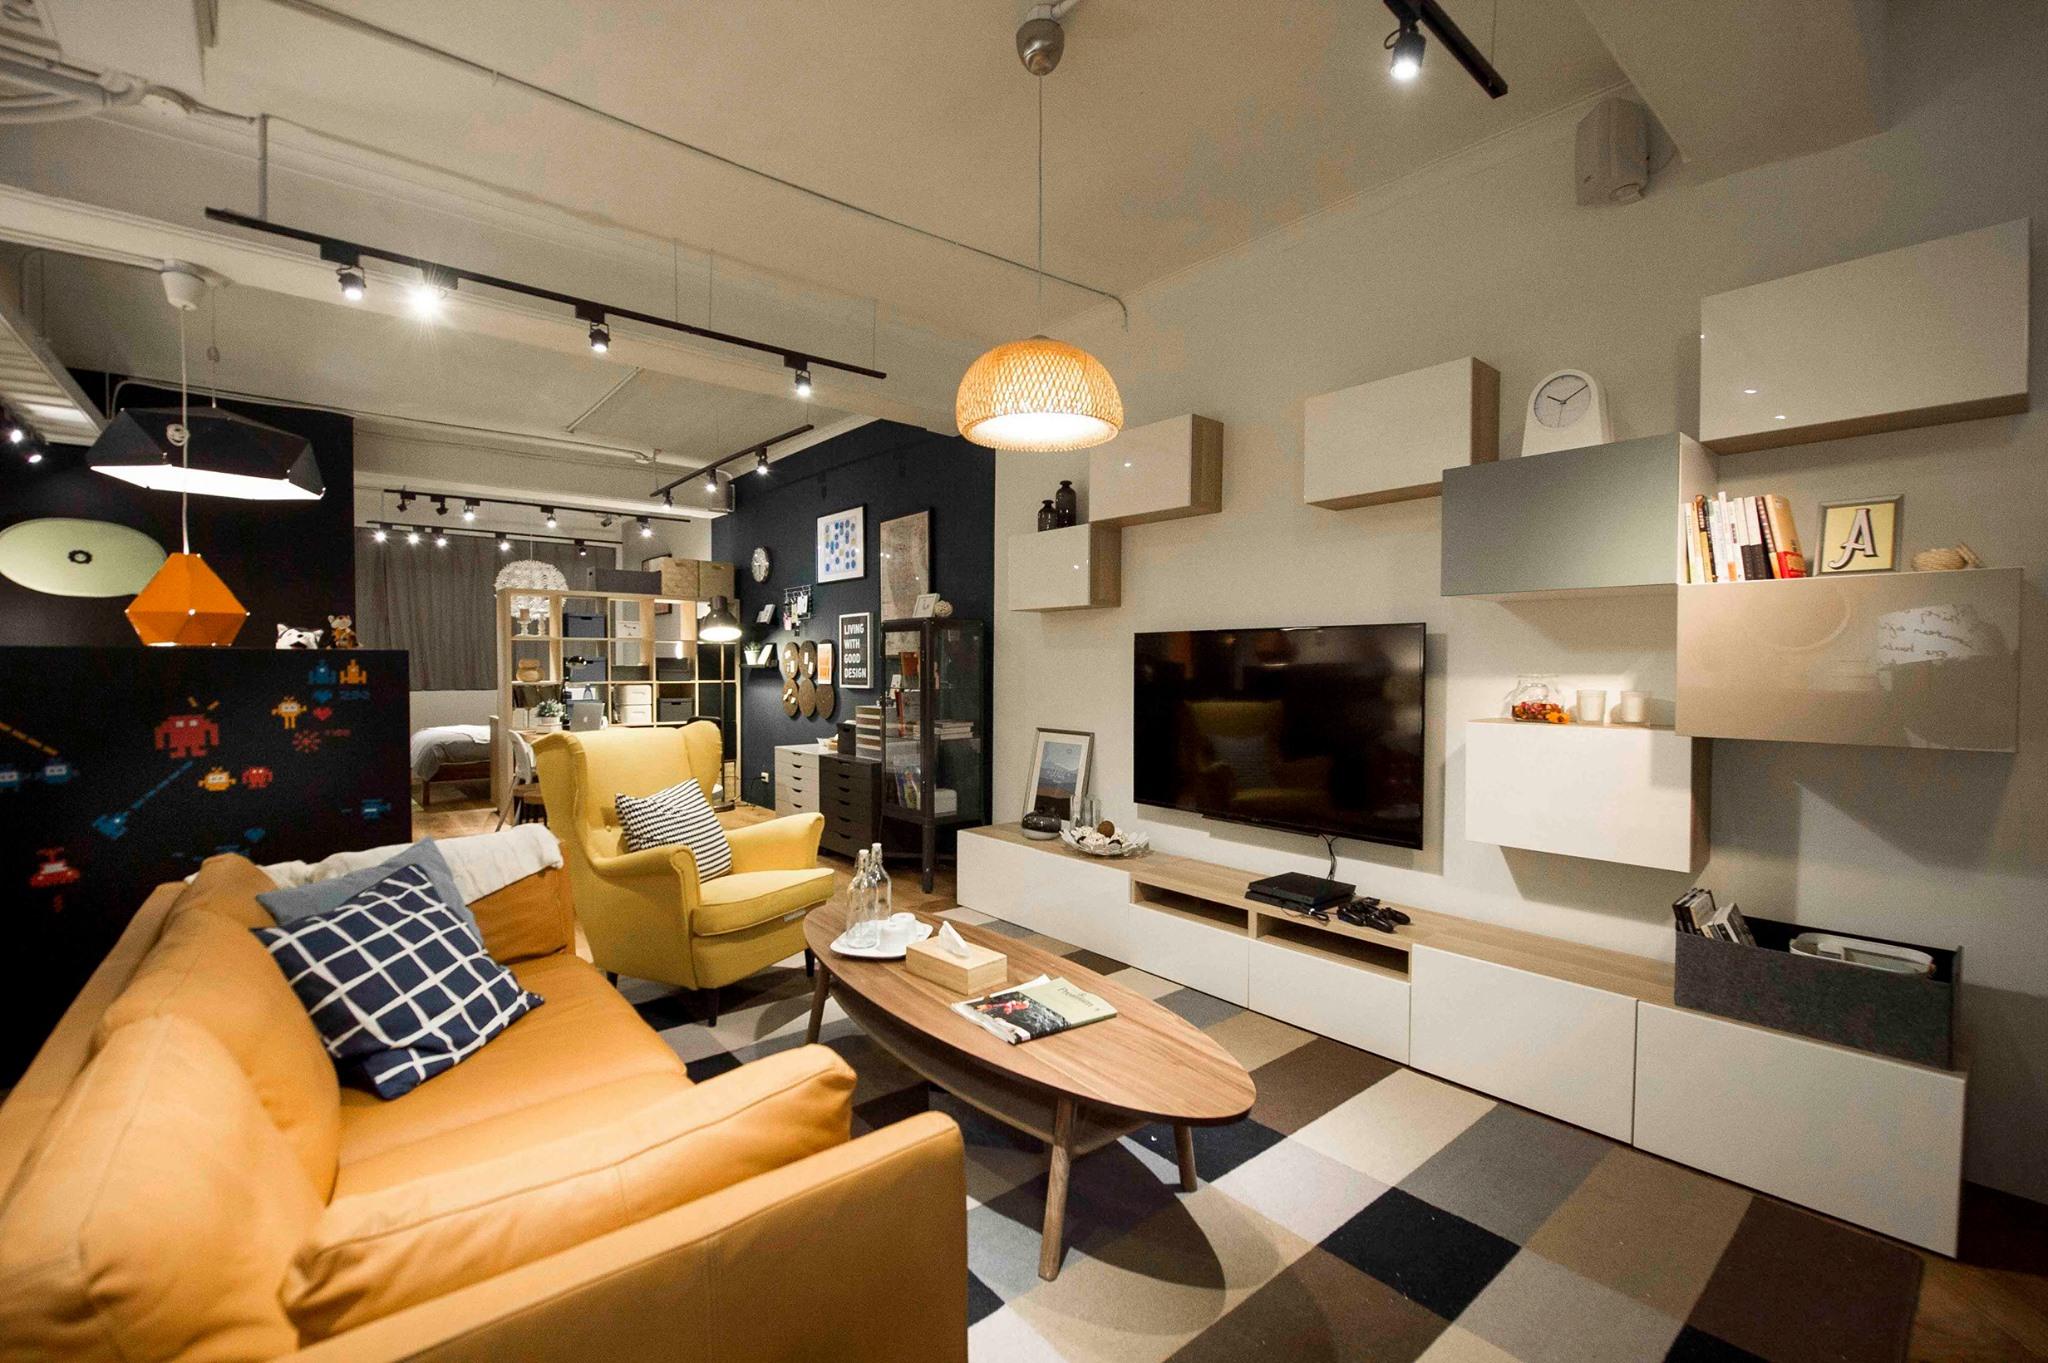 LED電視壁掛在牆壁上搭配橘色沙三人沙發 黃色單人沙發